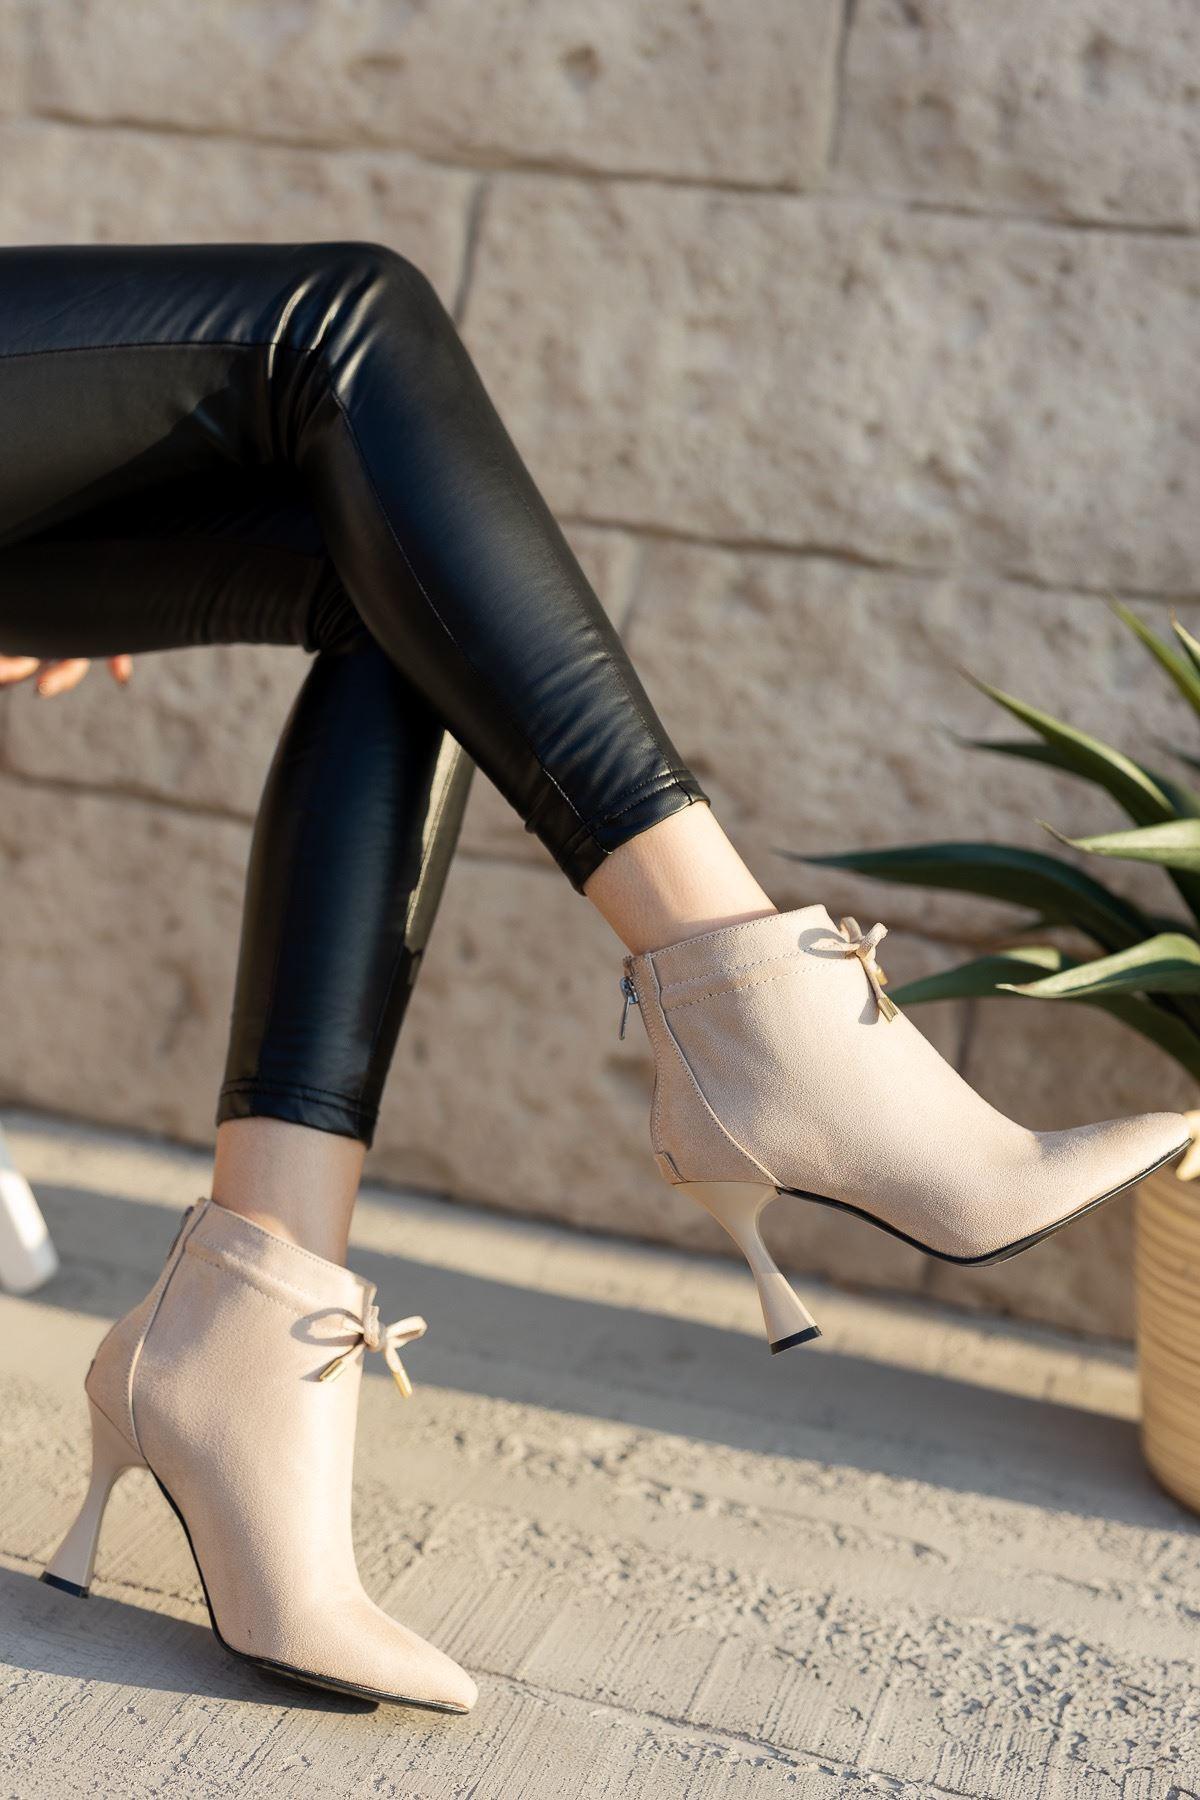 Kadın Minke Yüksek Kadeh Topuklu Ten Süet Bot